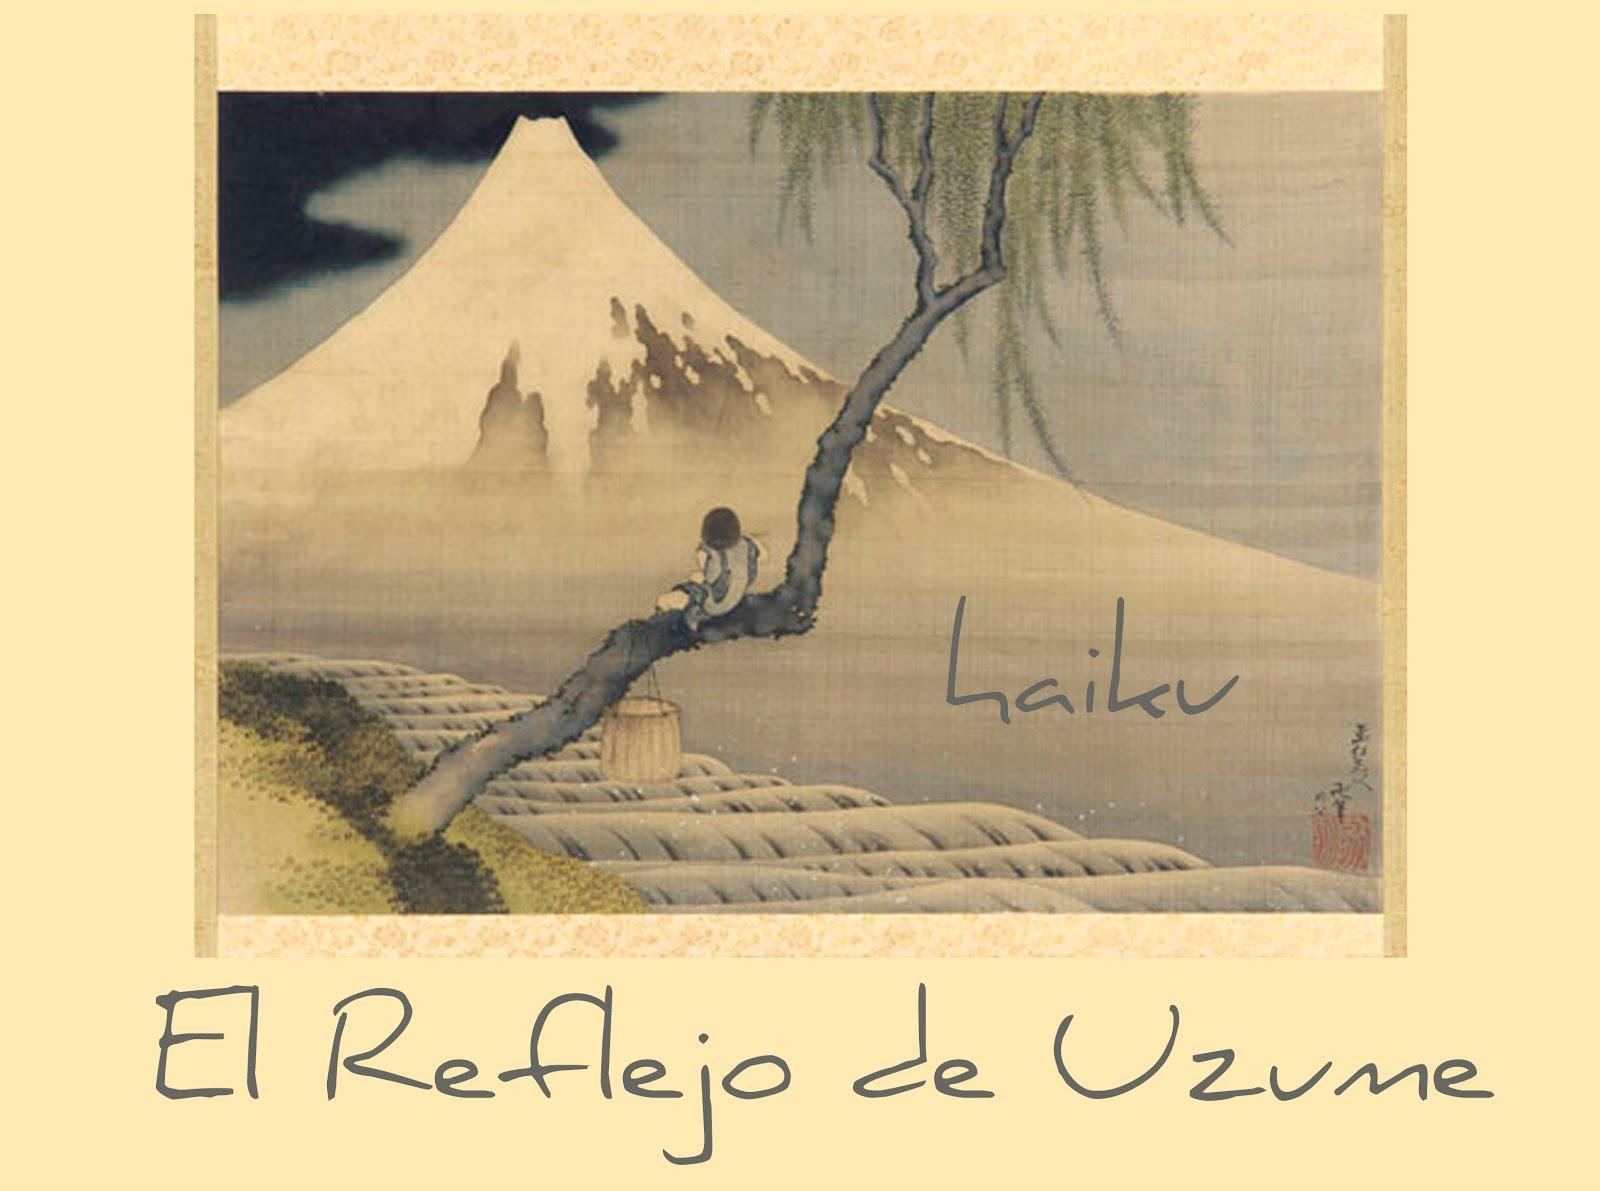 """El Reflejo de Uzume"""